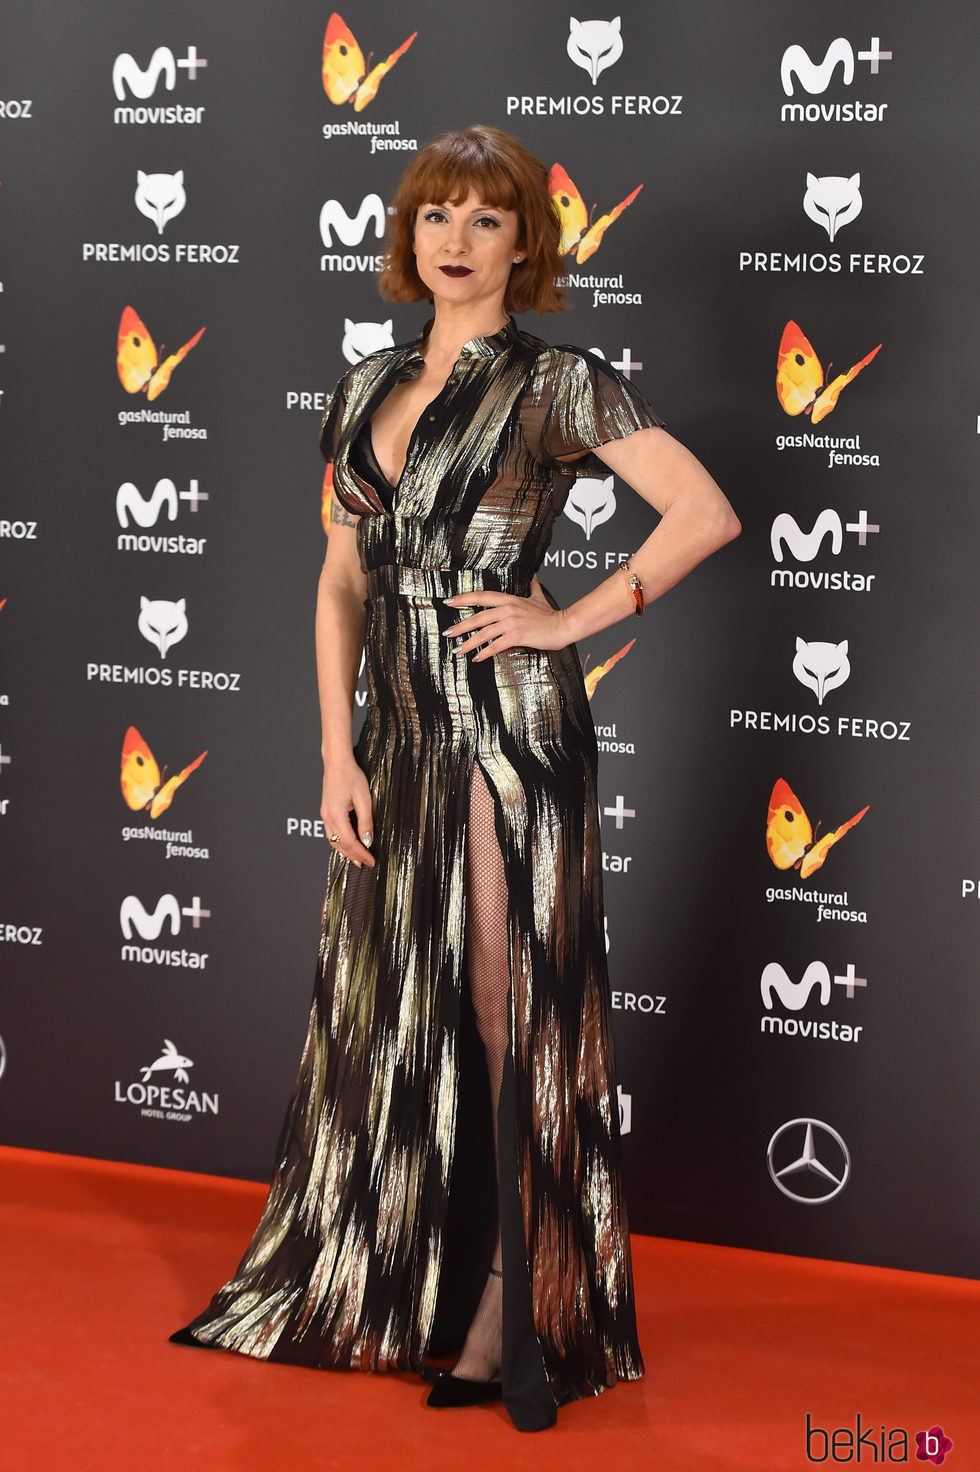 Najwa Nimri en la alfombra roja de los Premios Feroz 2017